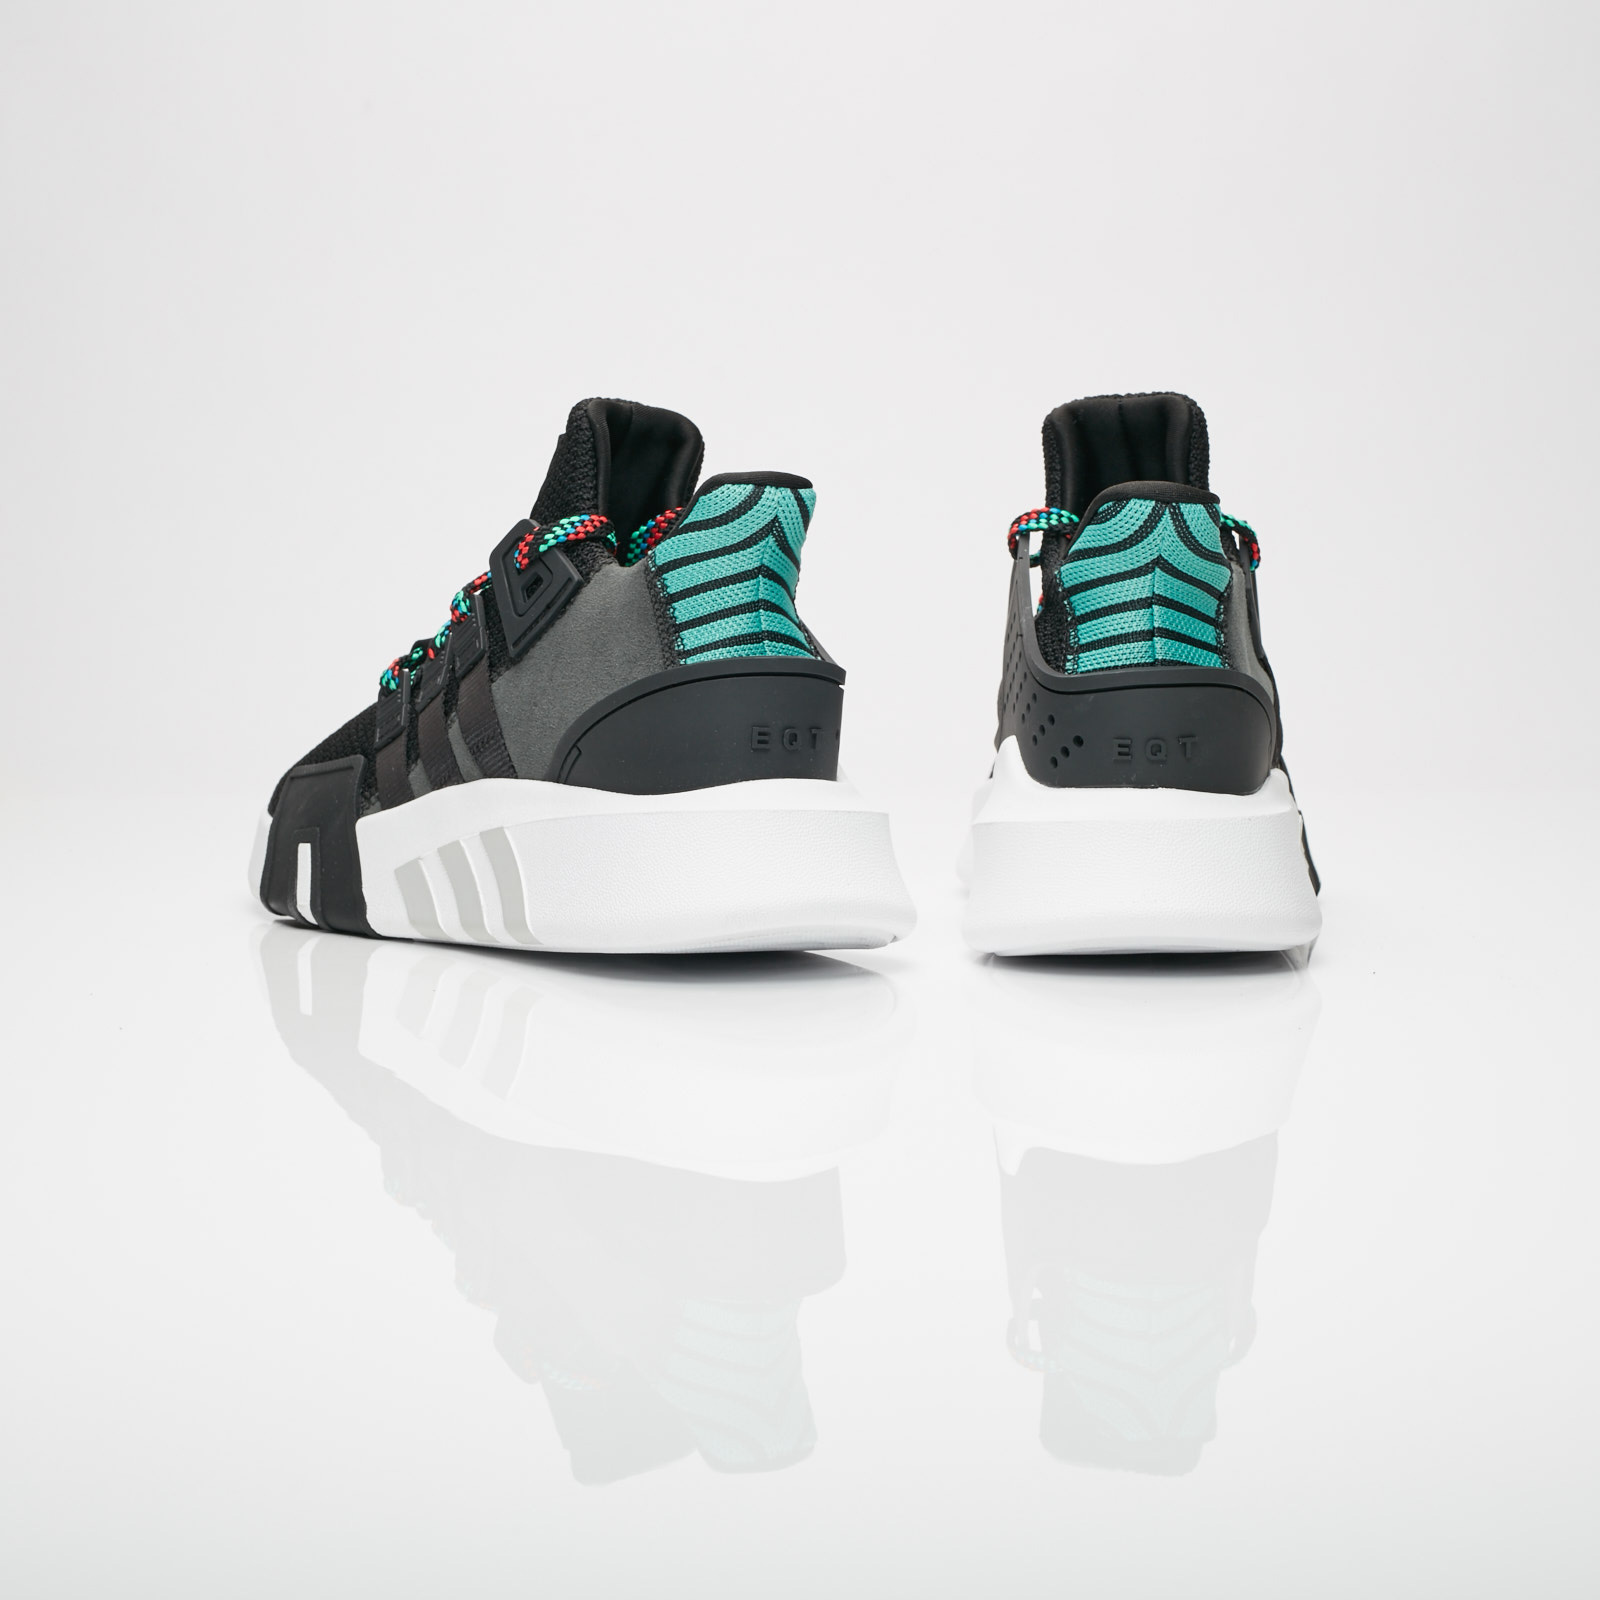 2df0ce26937 adidas EQT Basketball ADV - Cq2993 - Sneakersnstuff | sneakers & streetwear  online since 1999